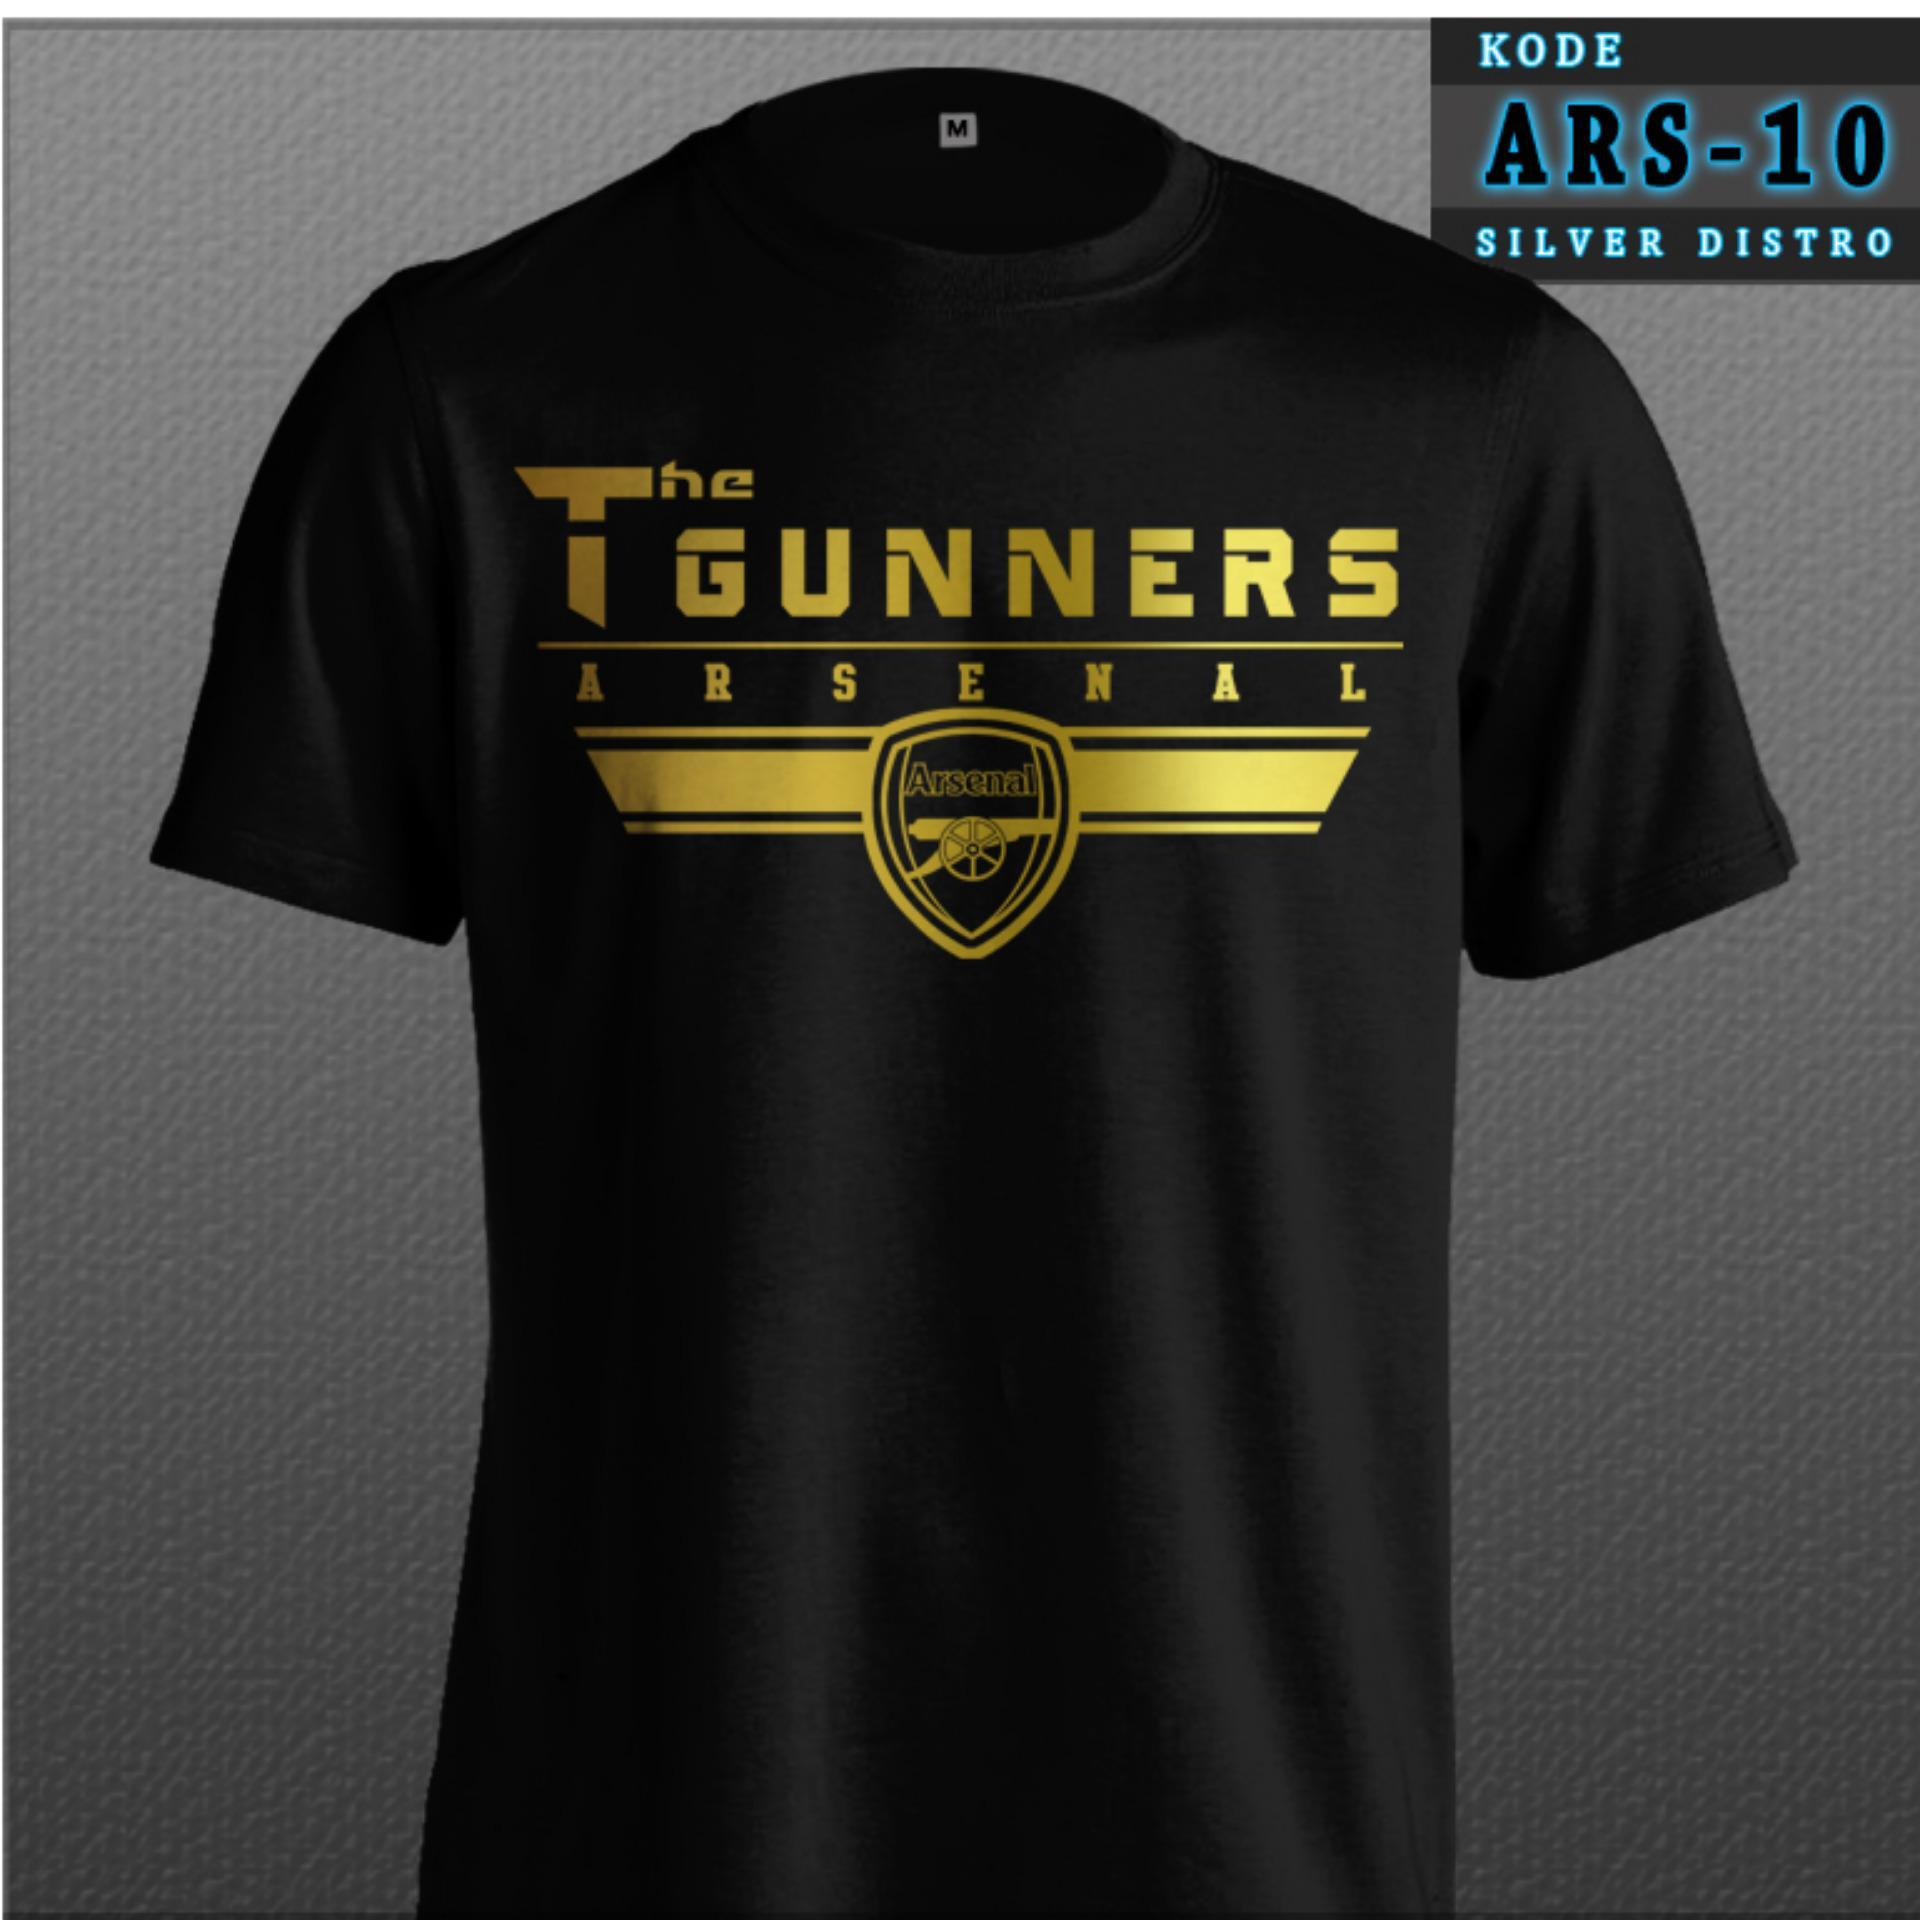 Fitur Kaos Arsenal The Gunners Victory Through Harmony Bahan Baju 02 Bola Distro Hitam Terbaru Bukan Jersey Ars 10